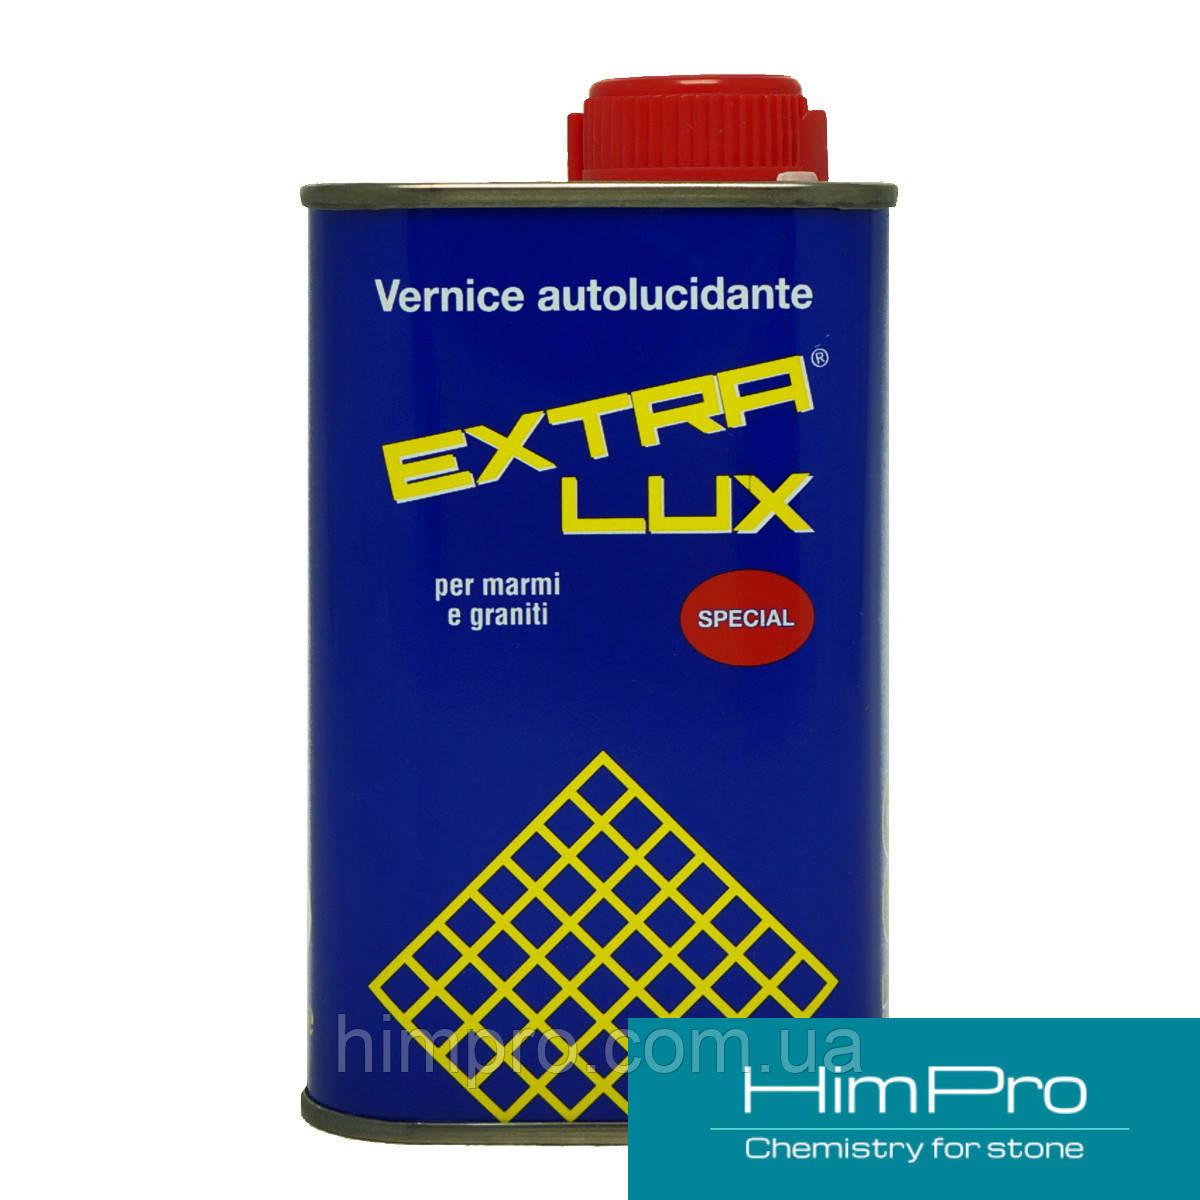 EXTRALUX  0.2L Ilpa Самополирующее средство (лак)